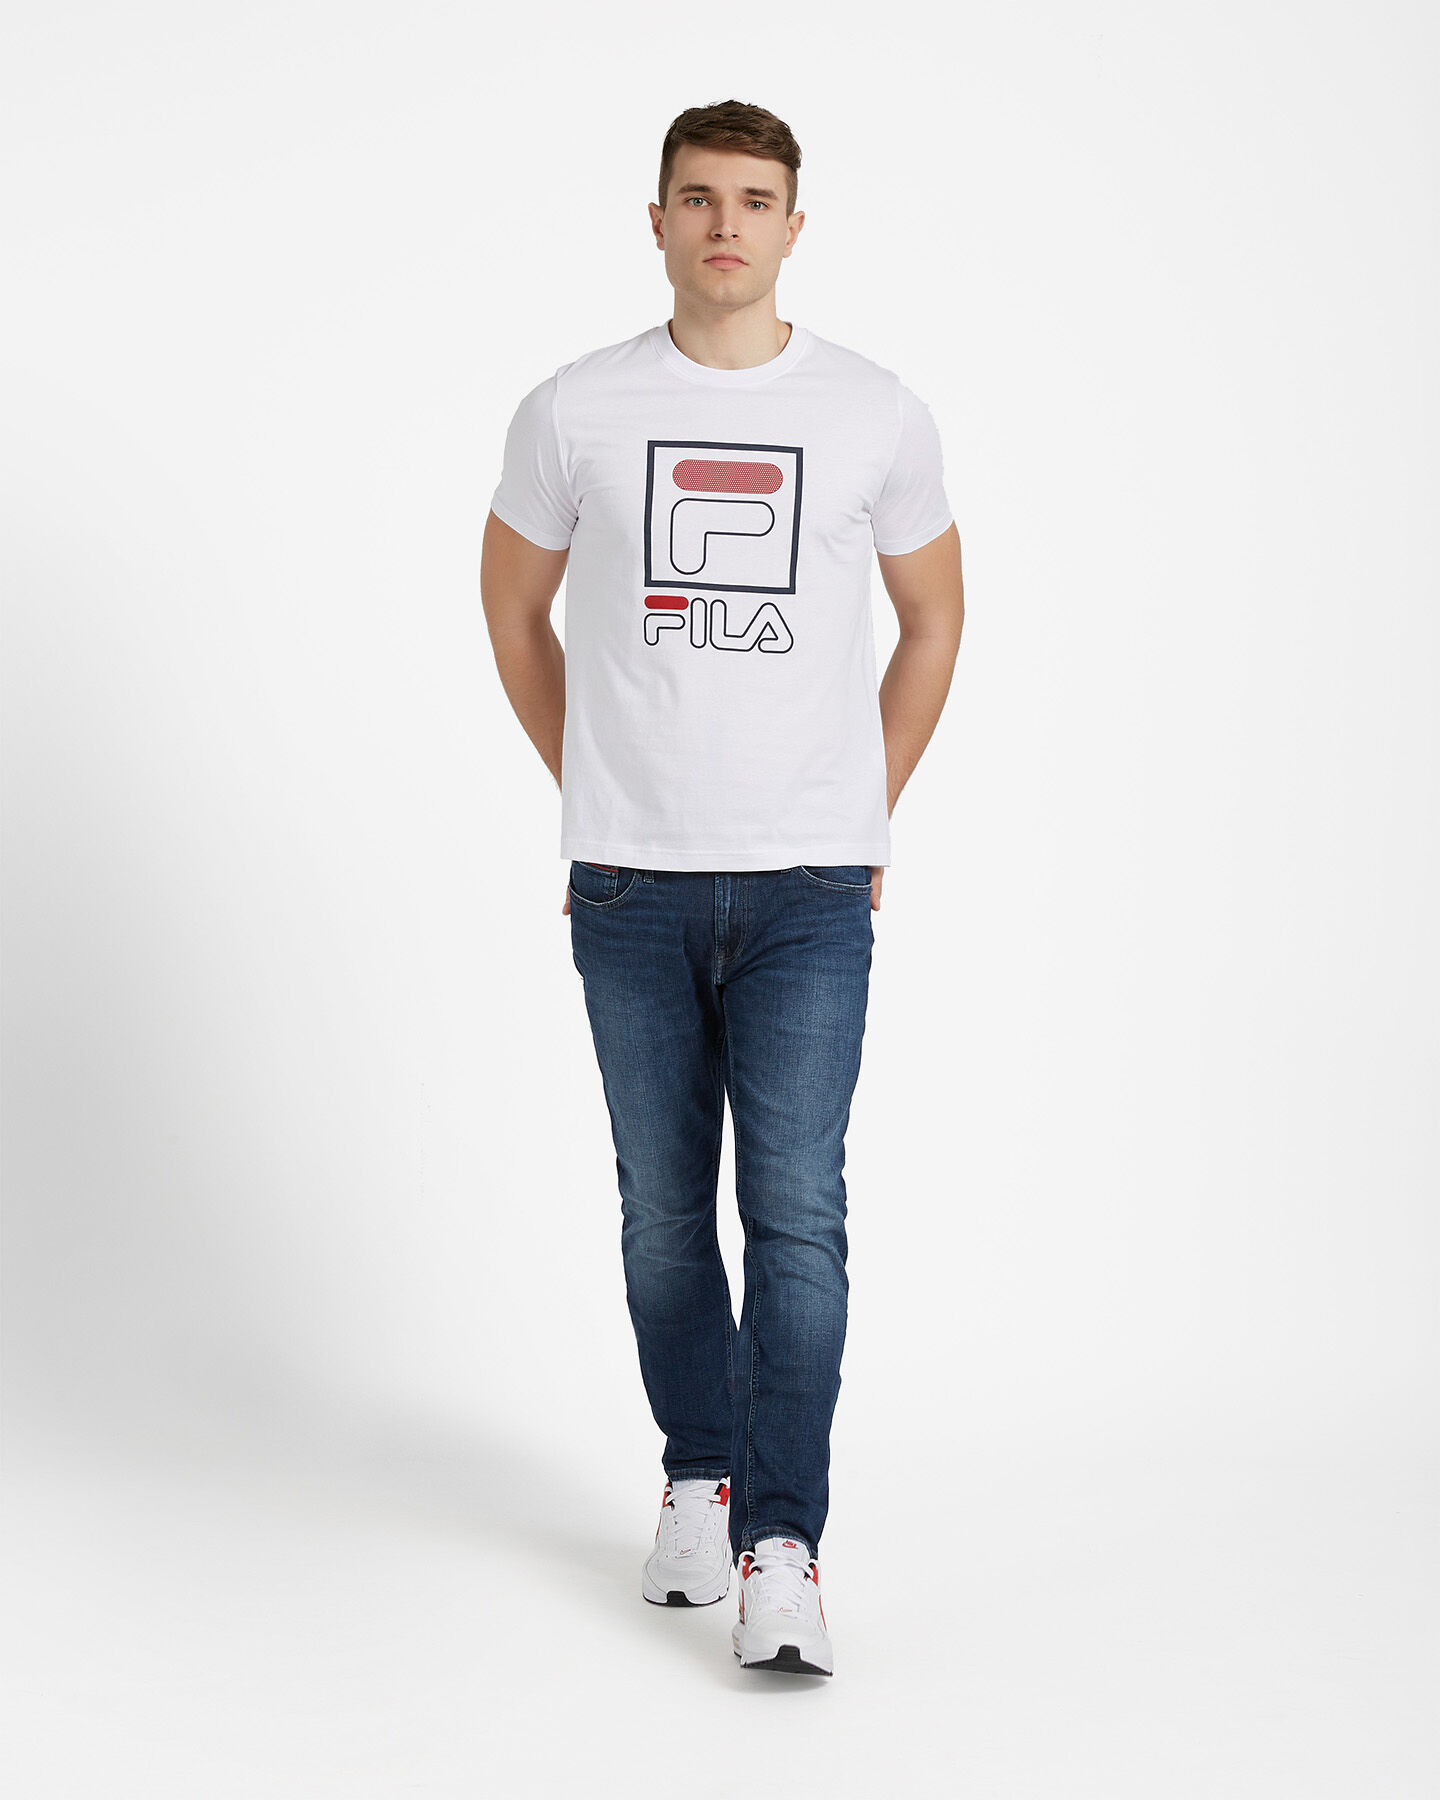 T-Shirt FILA LOGO VINTAGE M S4073889 scatto 3